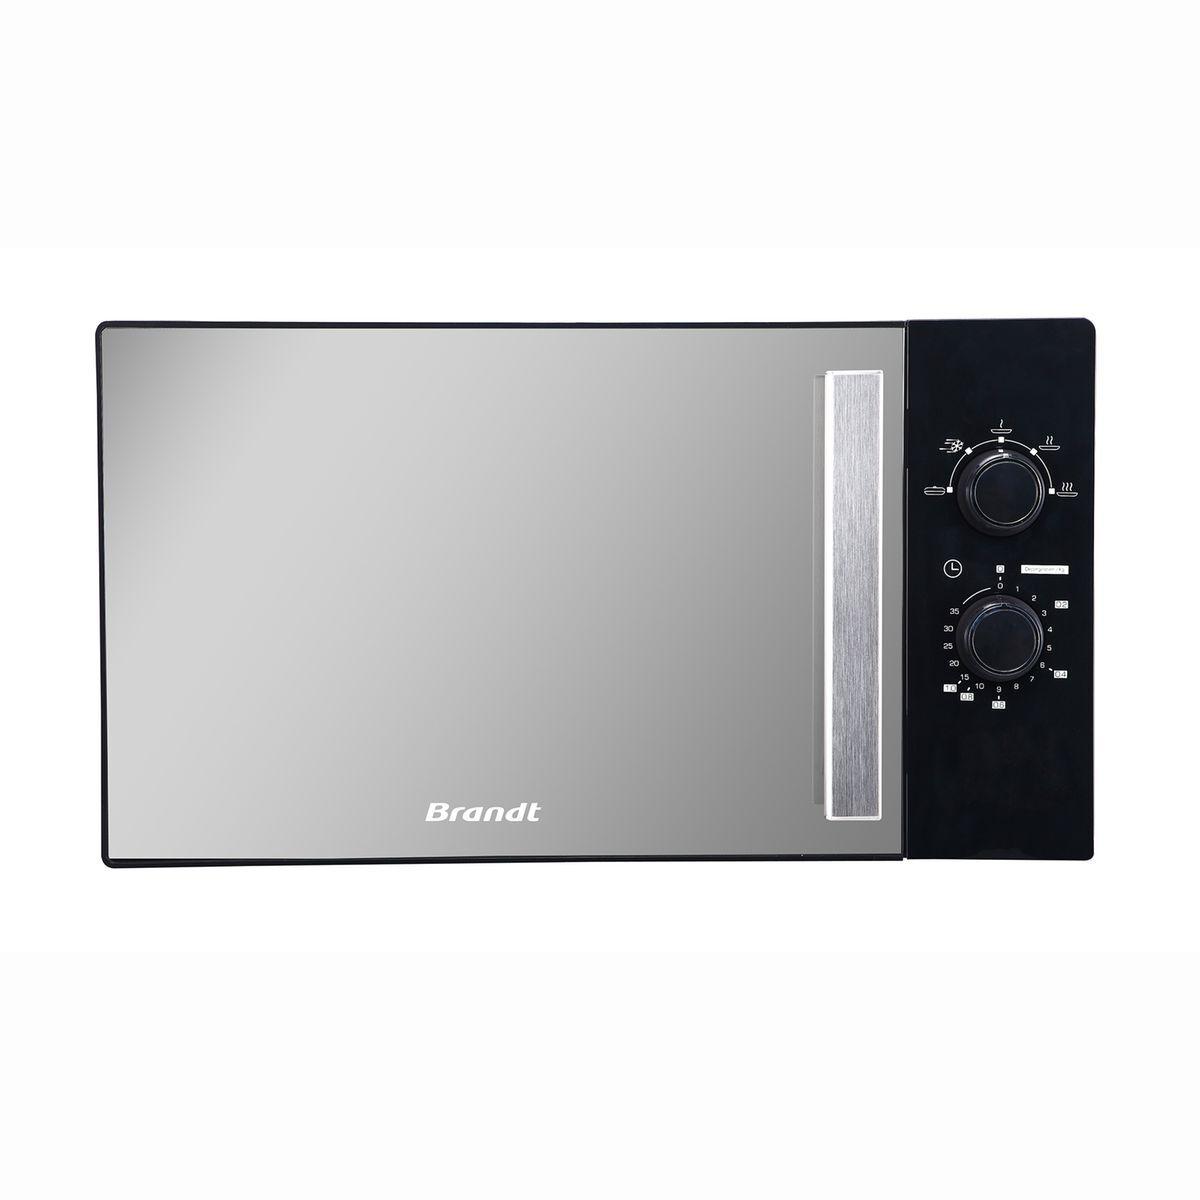 Brandt Micro-ondes monofonction SM2606B - BRANDT